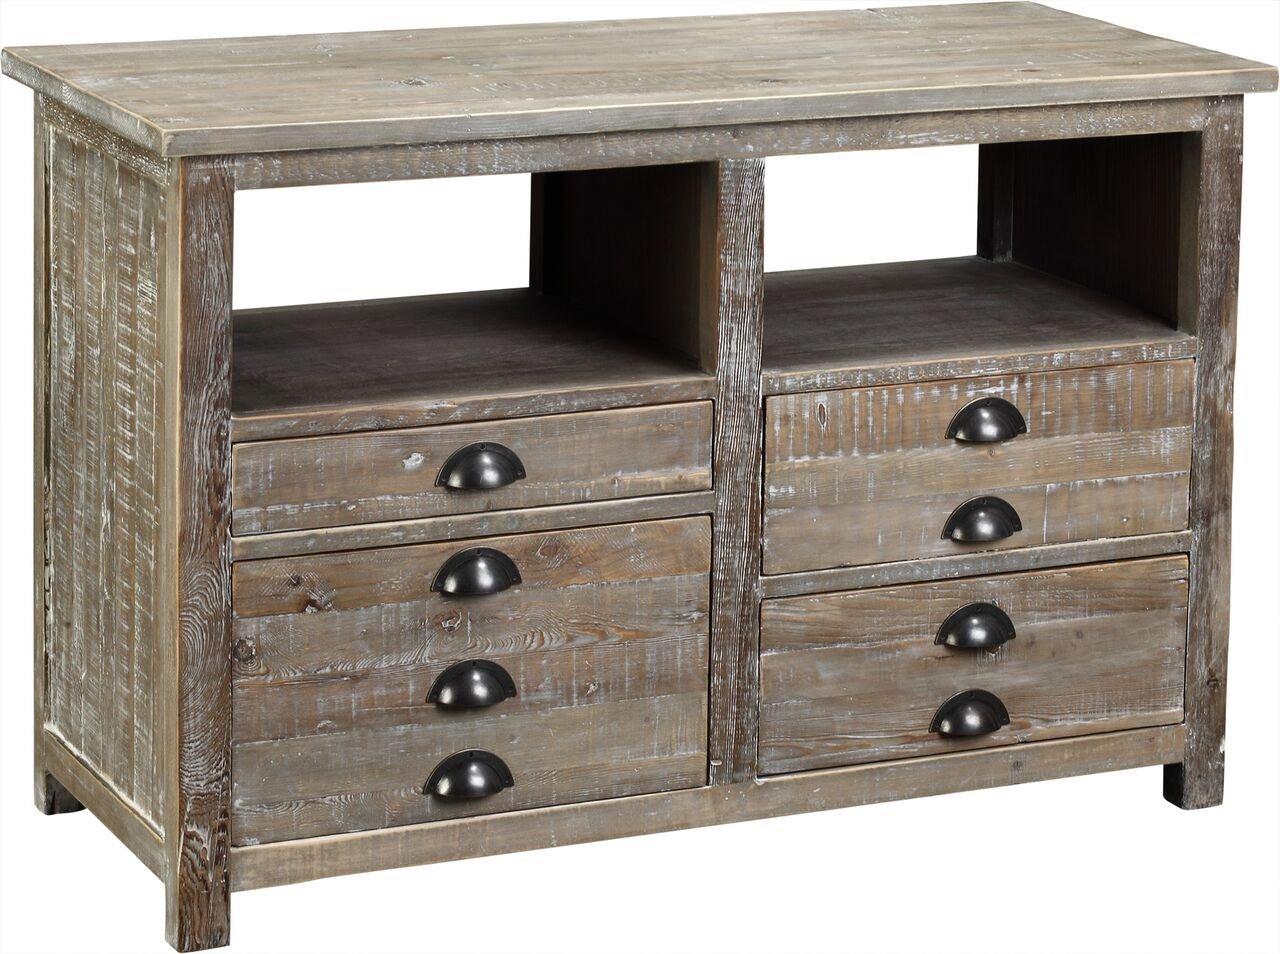 Burnham Home 17212 Dexter Media Cabinet, White-Wash